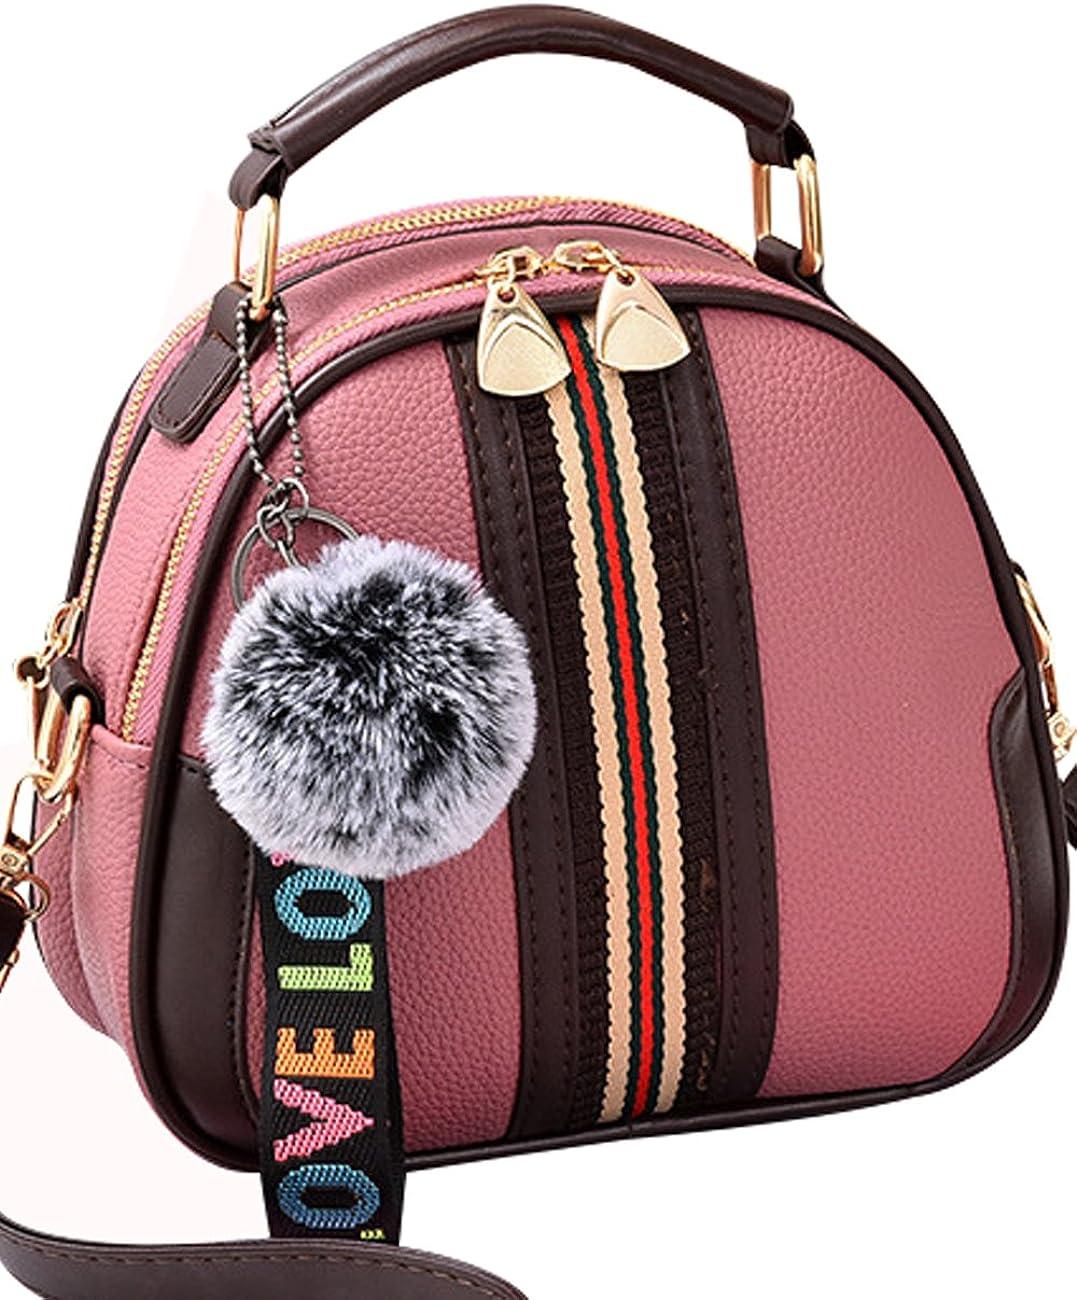 Zoulee Womens New PU Shoulder Bags Lady Handbag Messenger Bag